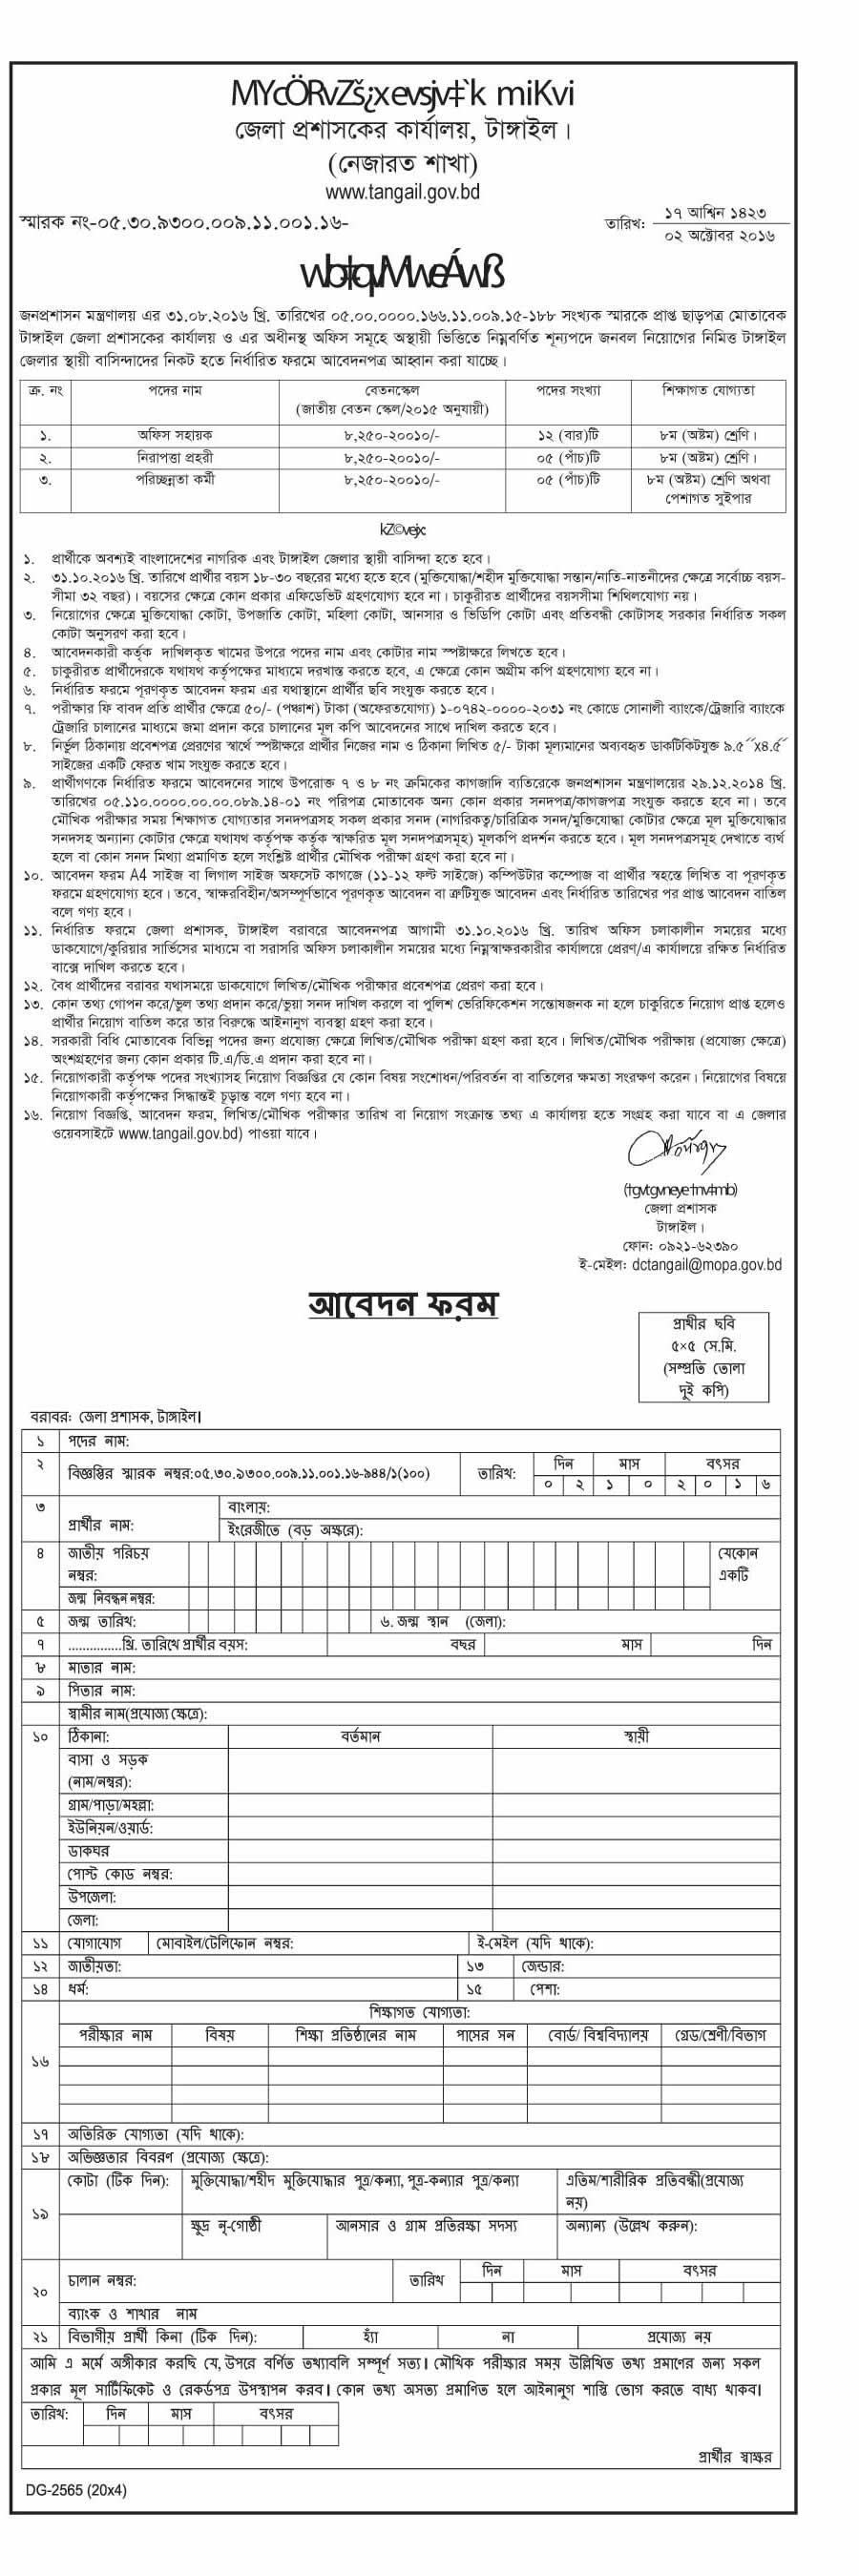 Jela Proshashok Karjaloy job circular 2016